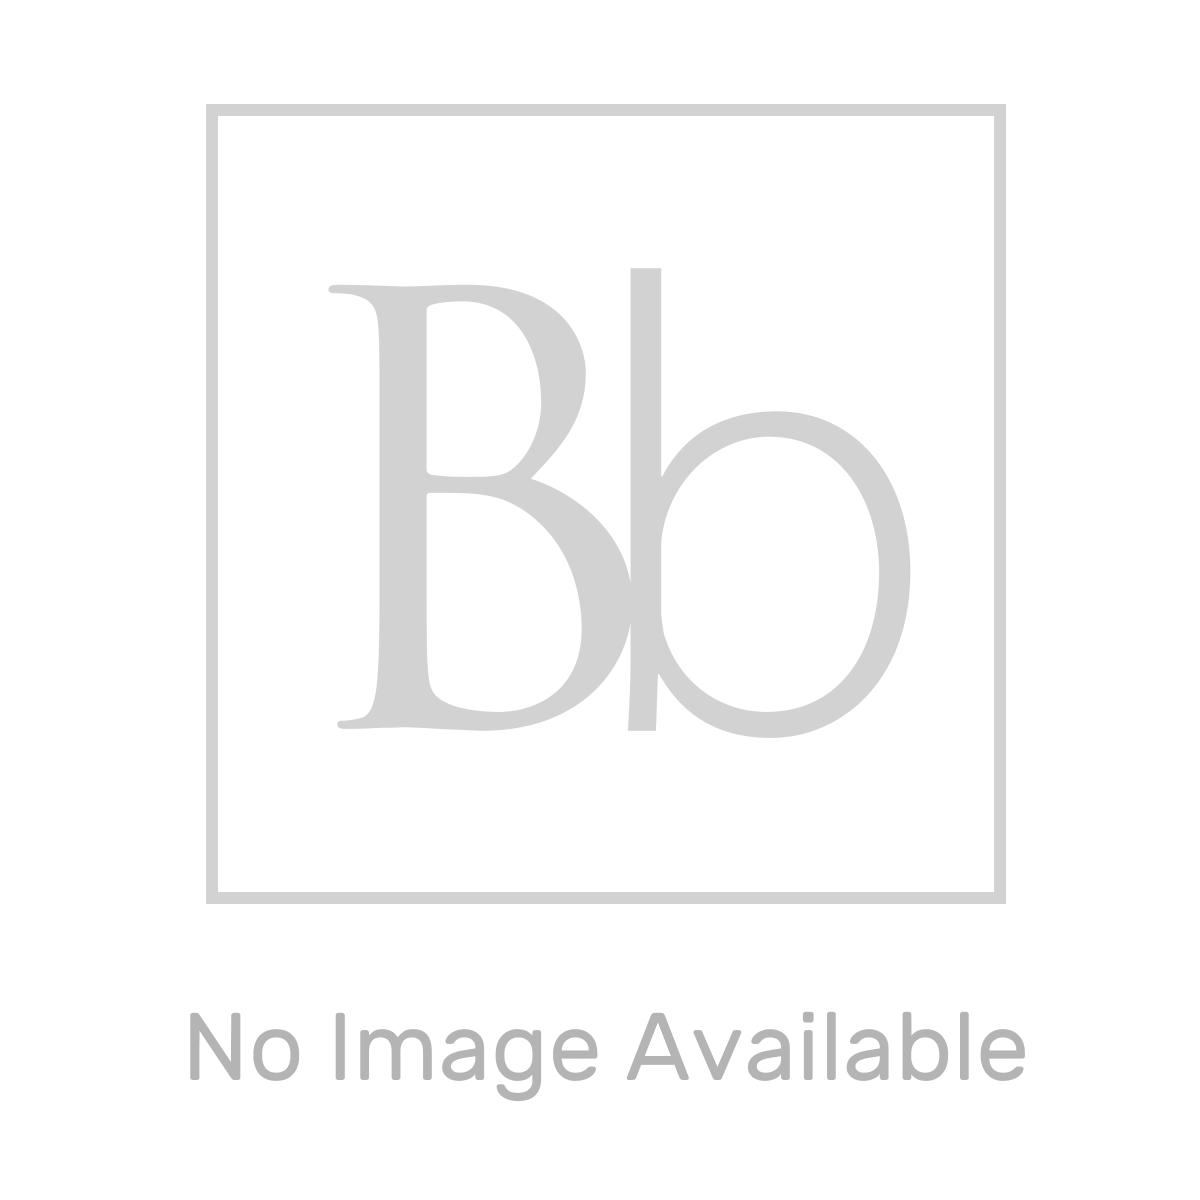 Merlyn MStone Rectangular Shower Tray Panel Set 1700 x 900mm